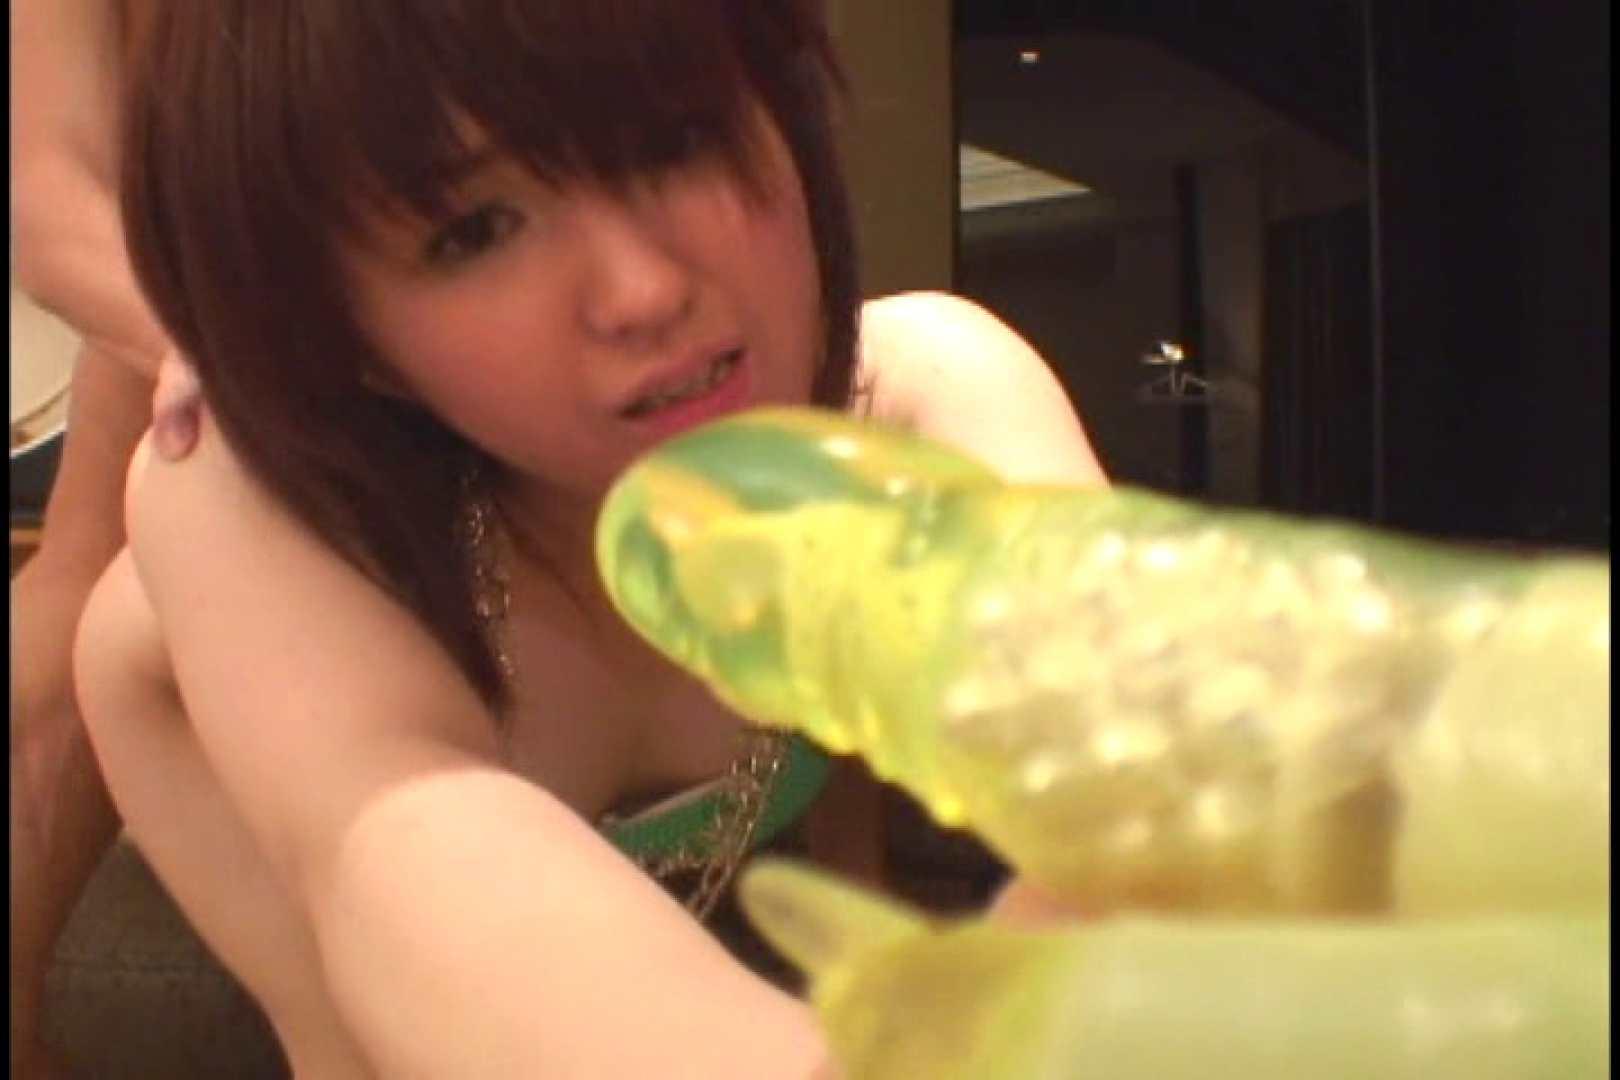 JDハンター全国ツアー vol.002 後編 女子大生のエロ動画  93PIX 10